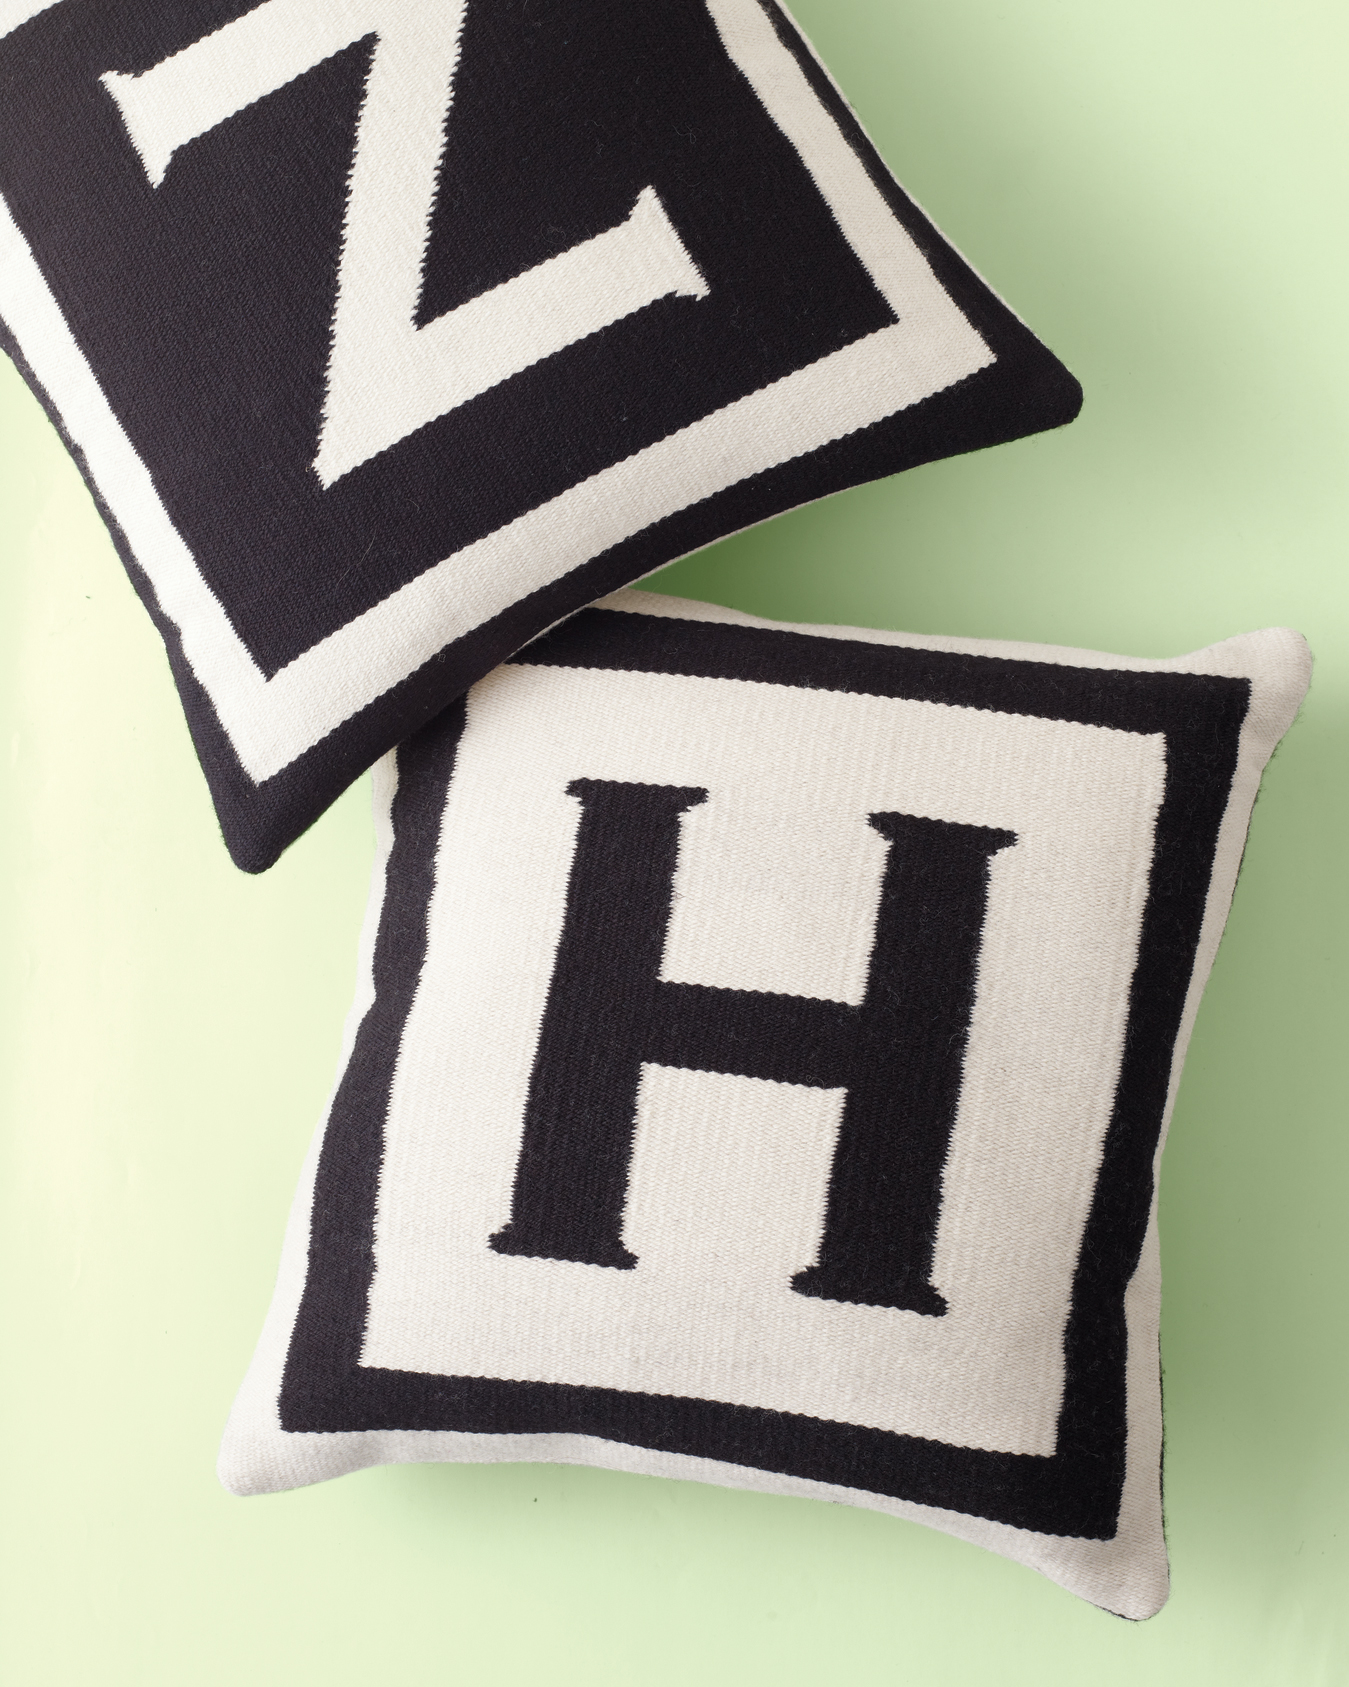 bw-pillows-mwd108401.jpg